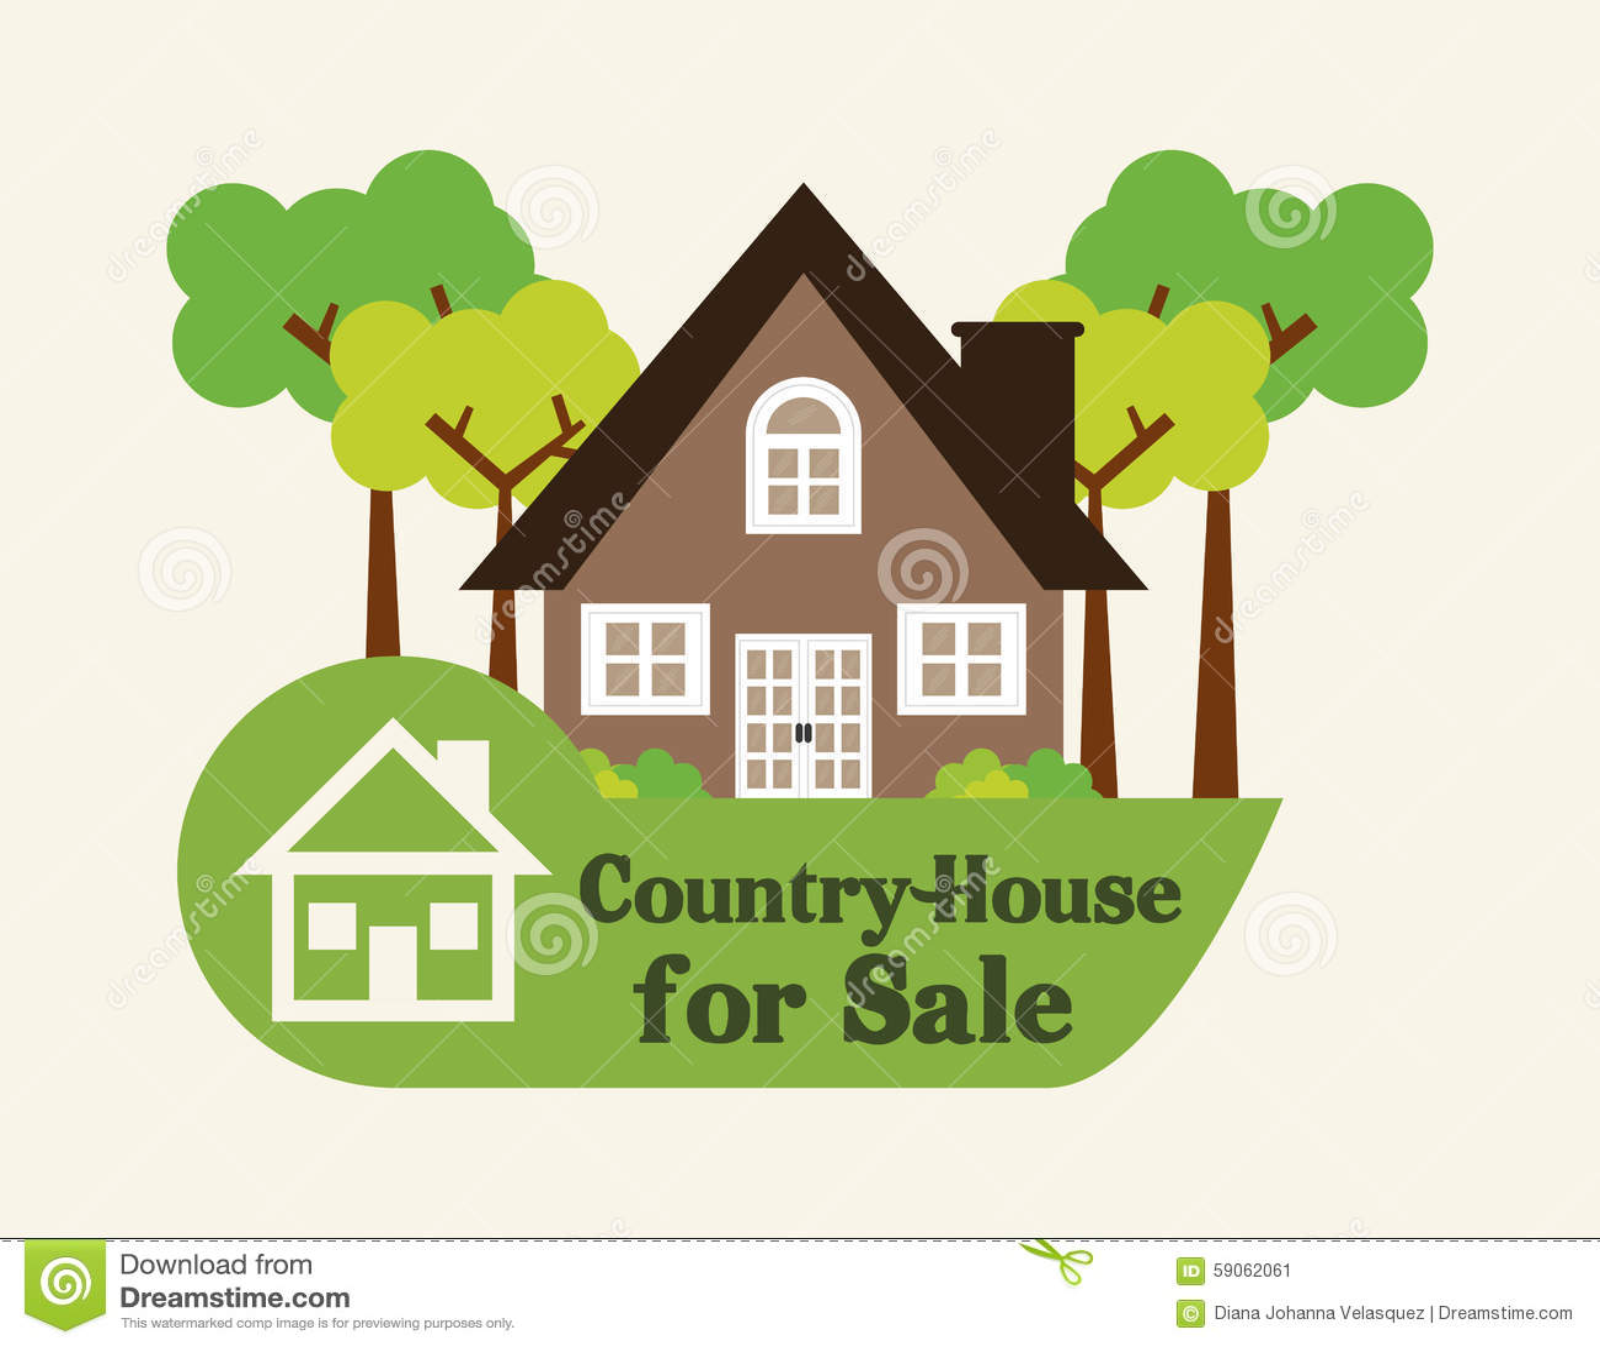 House design stock vector image 59062061 for Digital house design